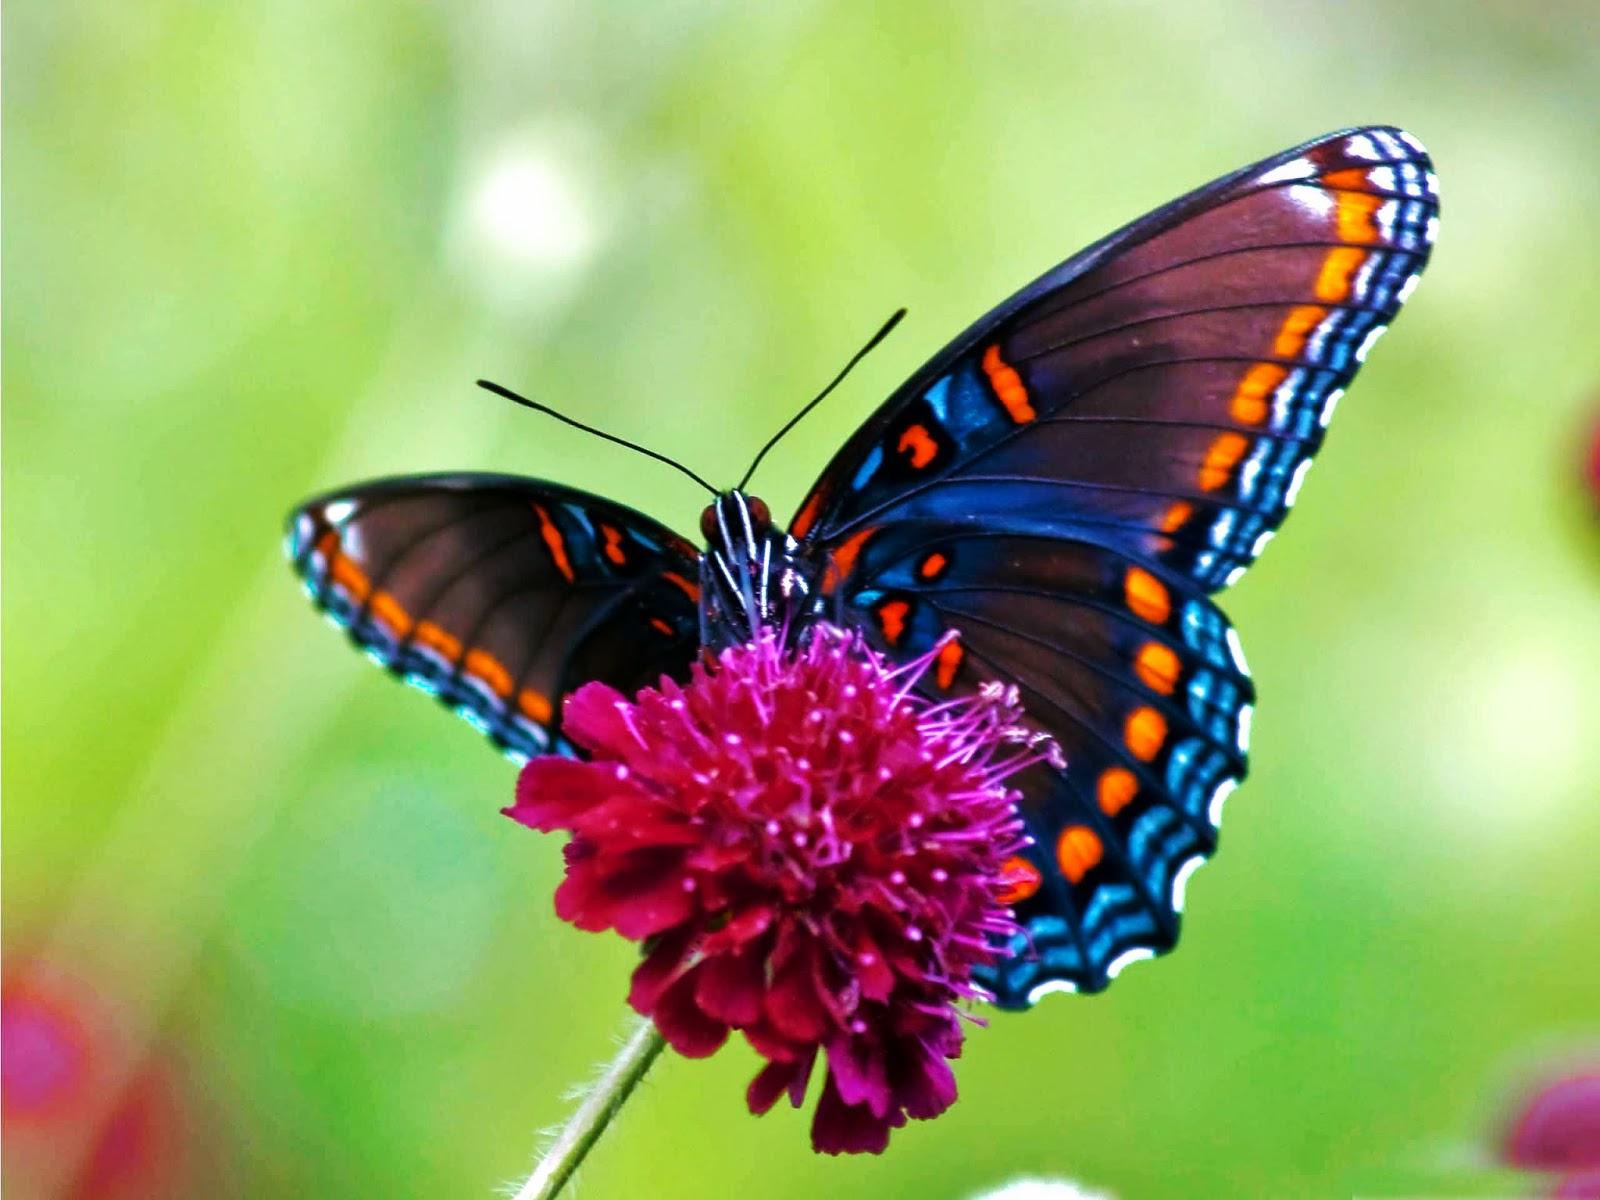 free live butterfly wallpaper 201411 bodyandsoulnourishmentblog 1600x1200